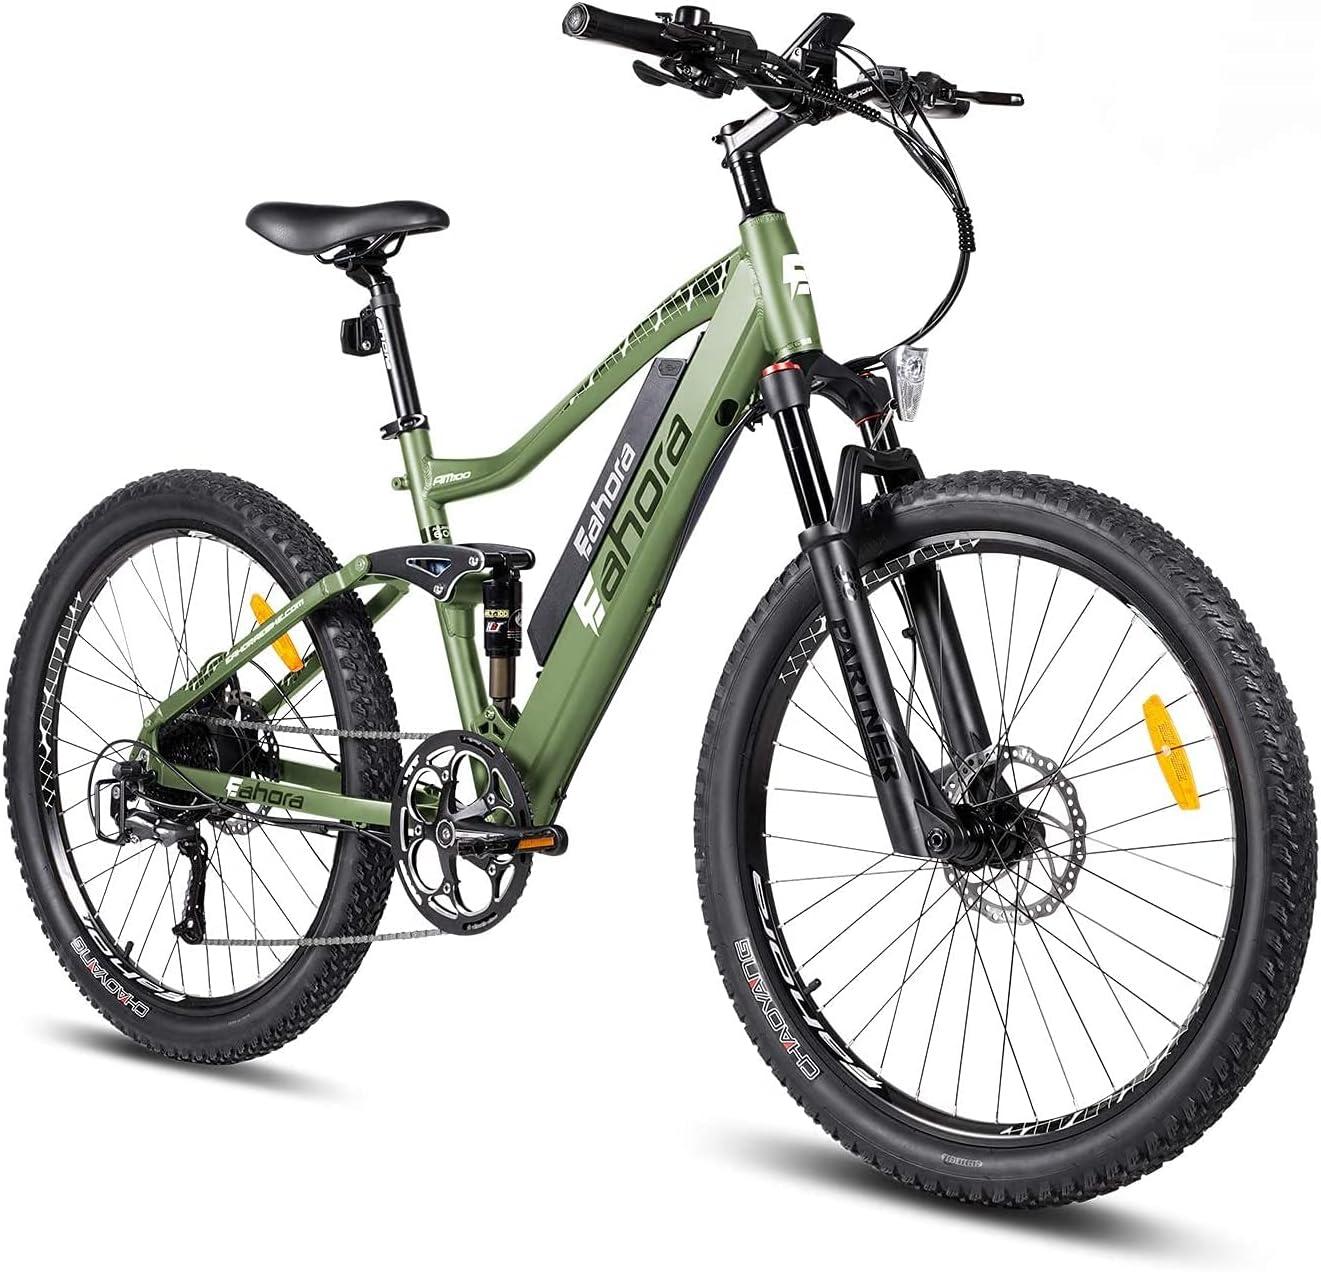 eAhora Electric Max 62% Topics on TV OFF Bike 27.5'' AM100 f Plus Mountain Bikes